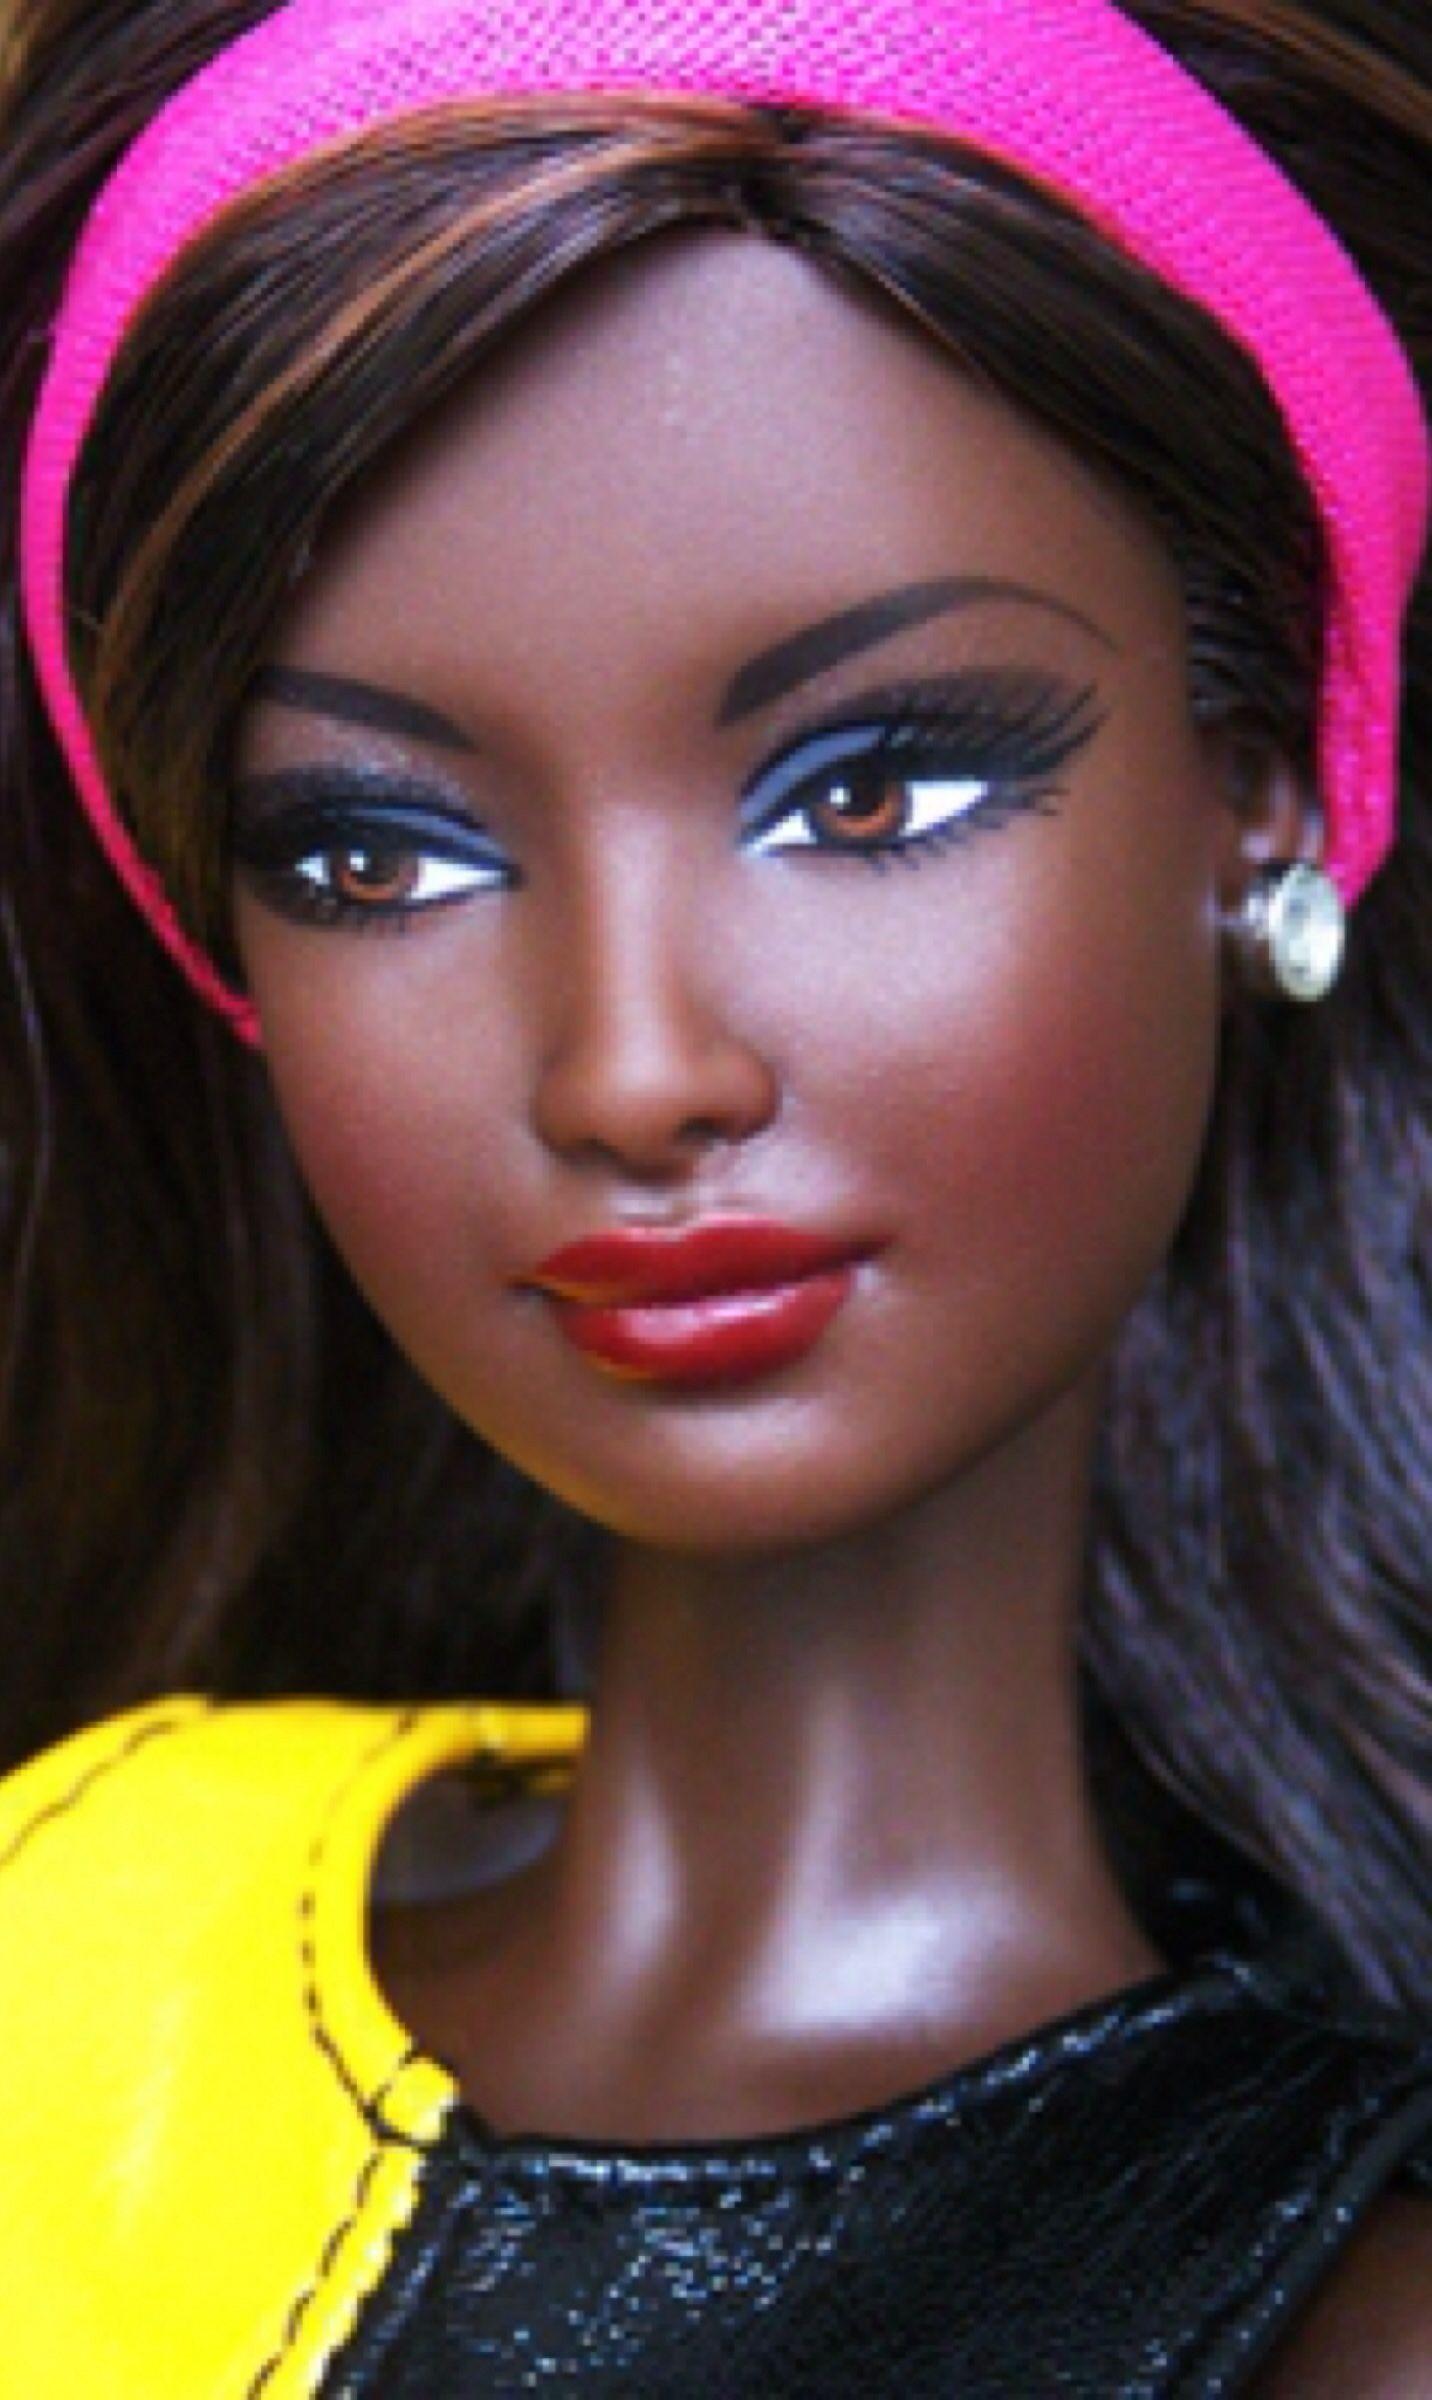 Pin by Сергей Петров on forrst Black barbie, Black doll